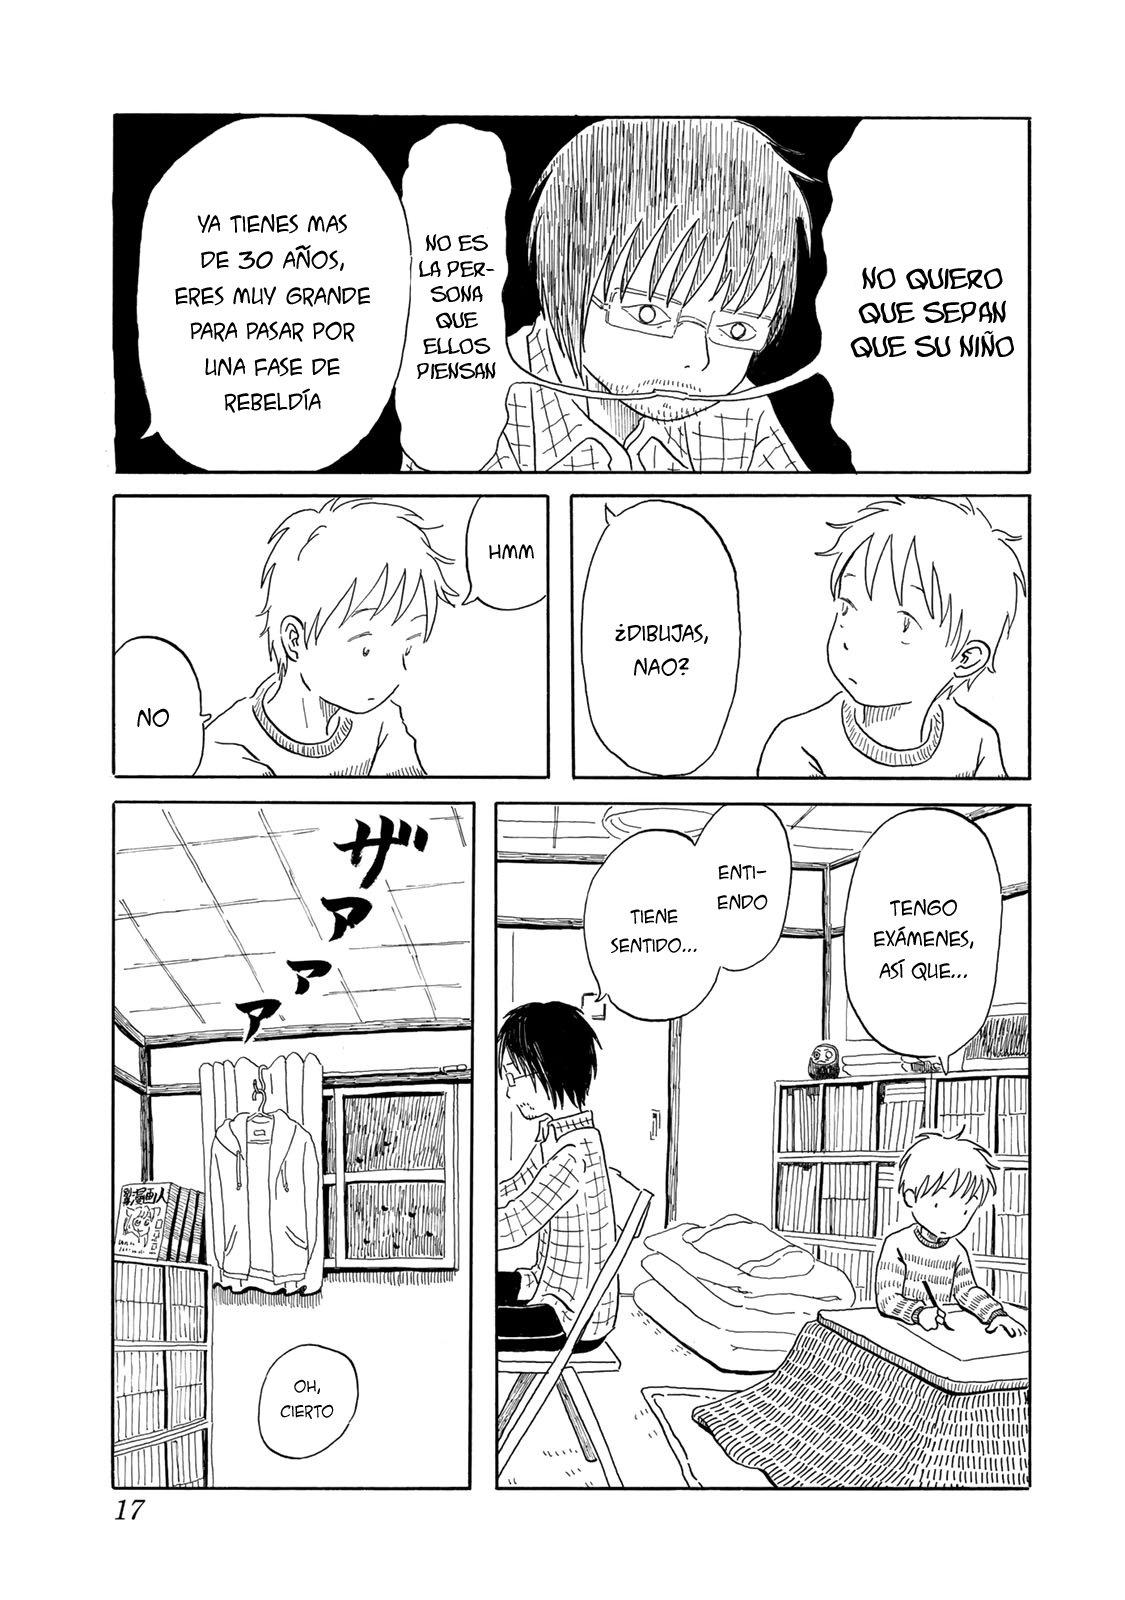 https://nine.mangadogs.com/es_manga/pic8/50/36658/946317/0105d35f6b00f643bf6161666aa20975.jpg Page 18